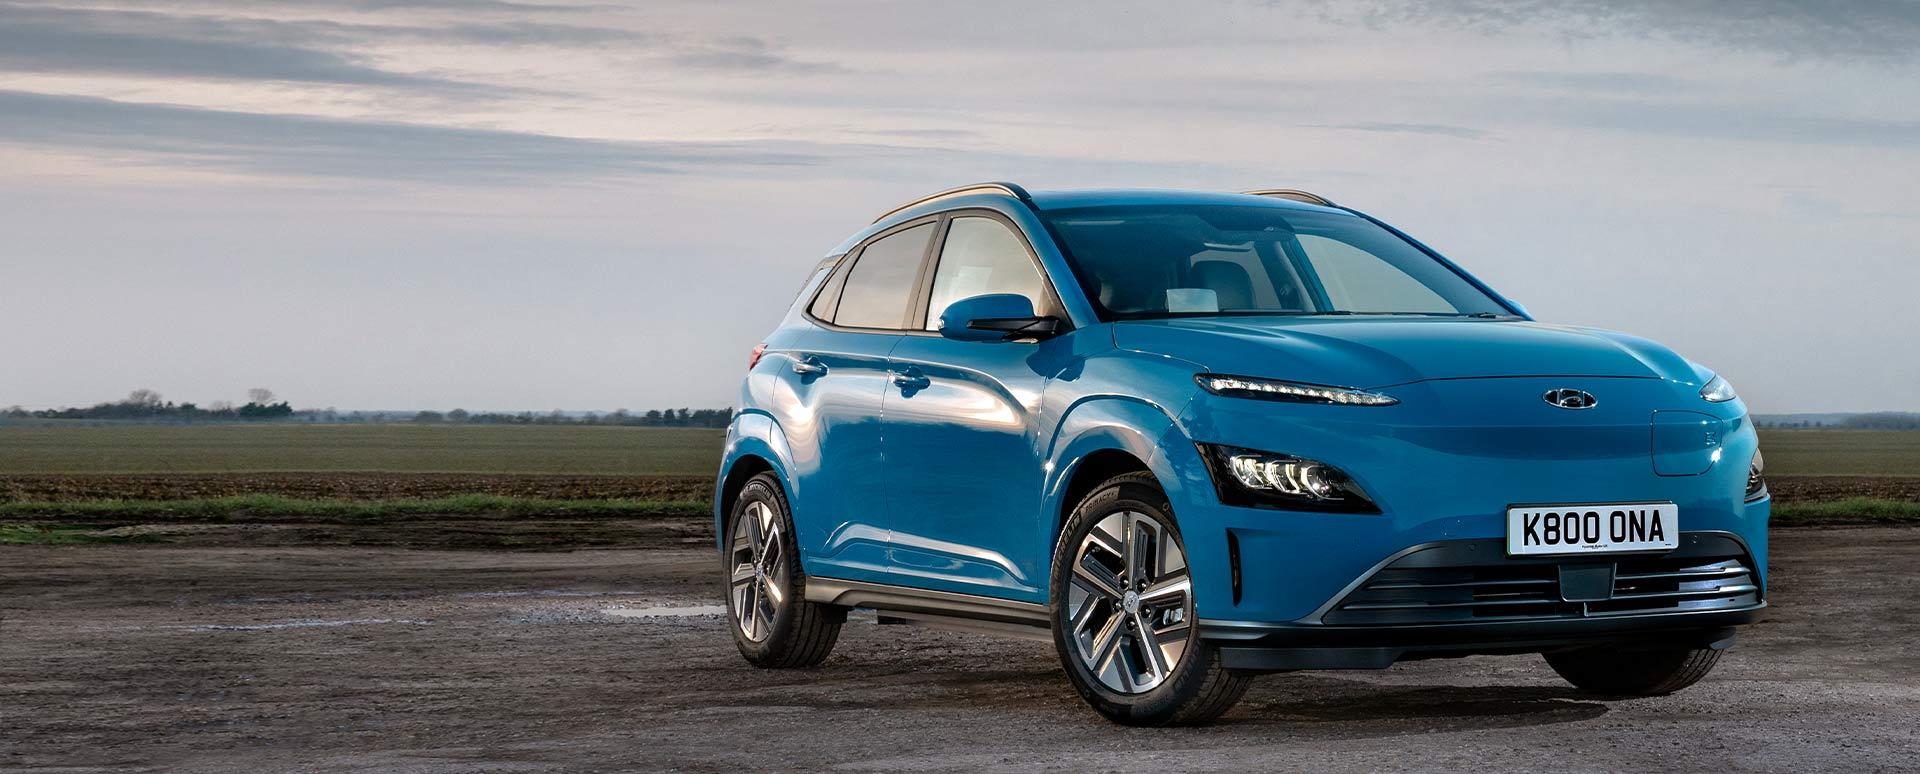 blue hyundai kona electric, parked